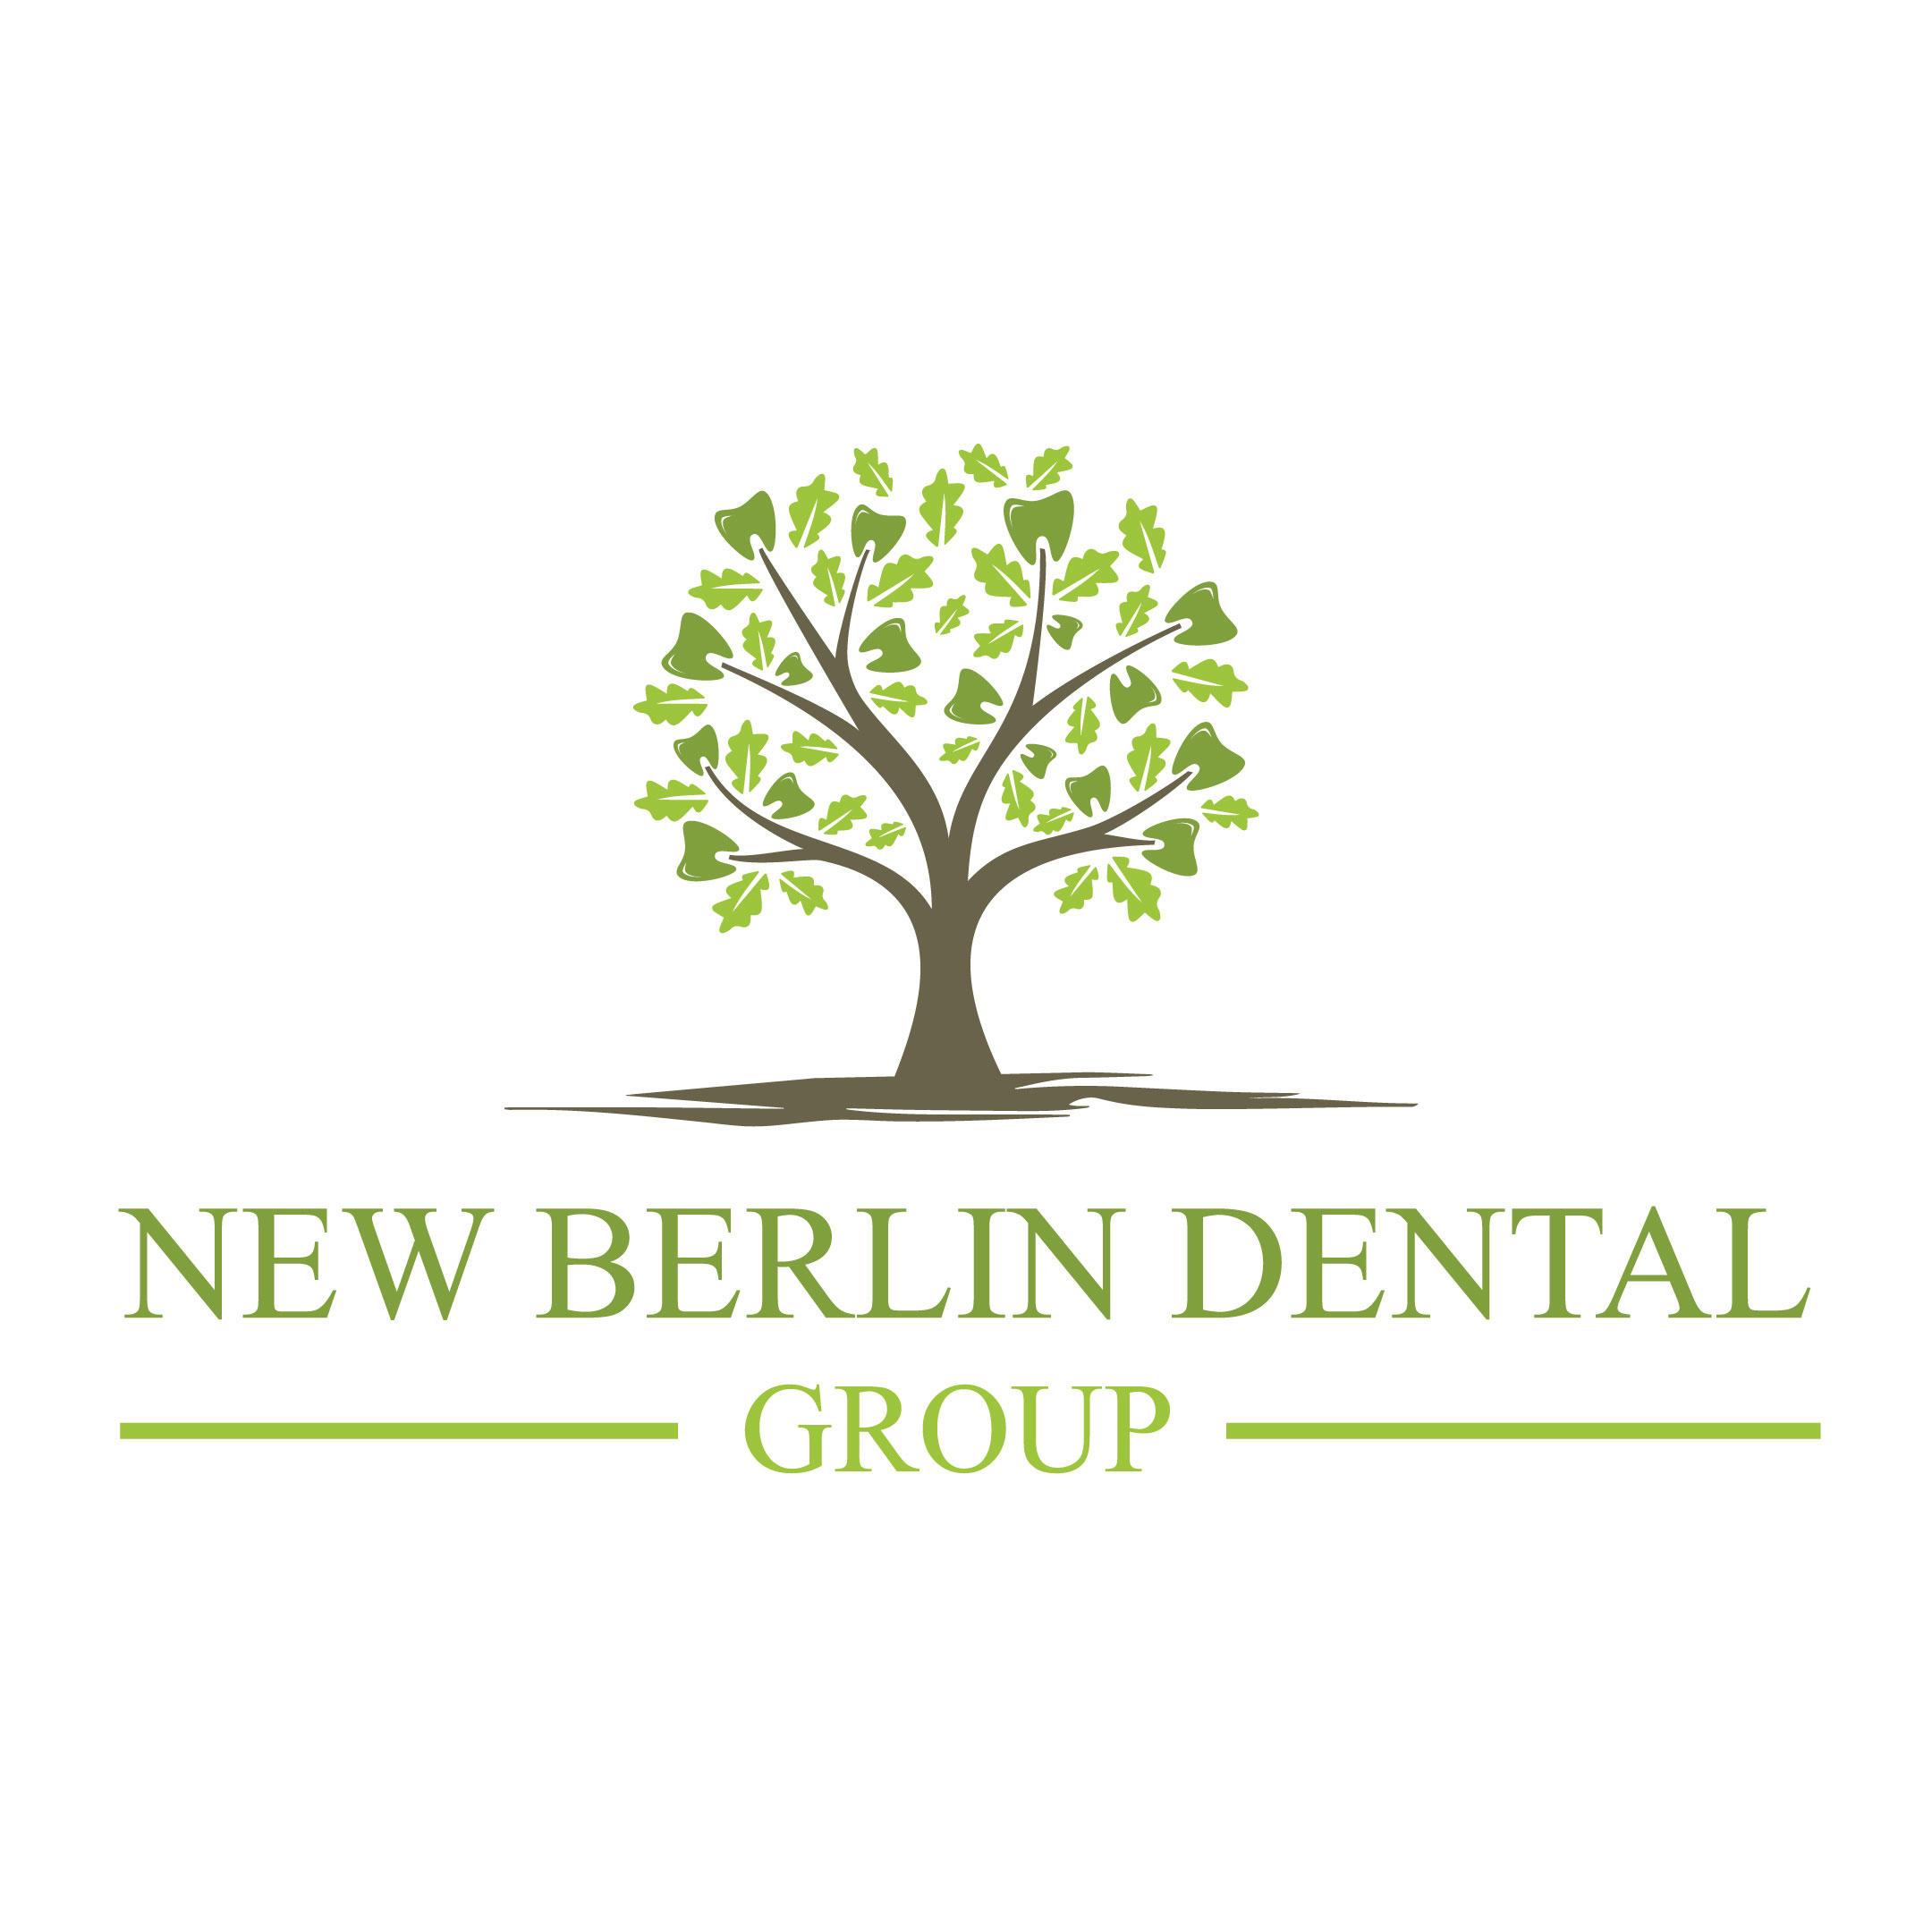 New Berlin Dental Group